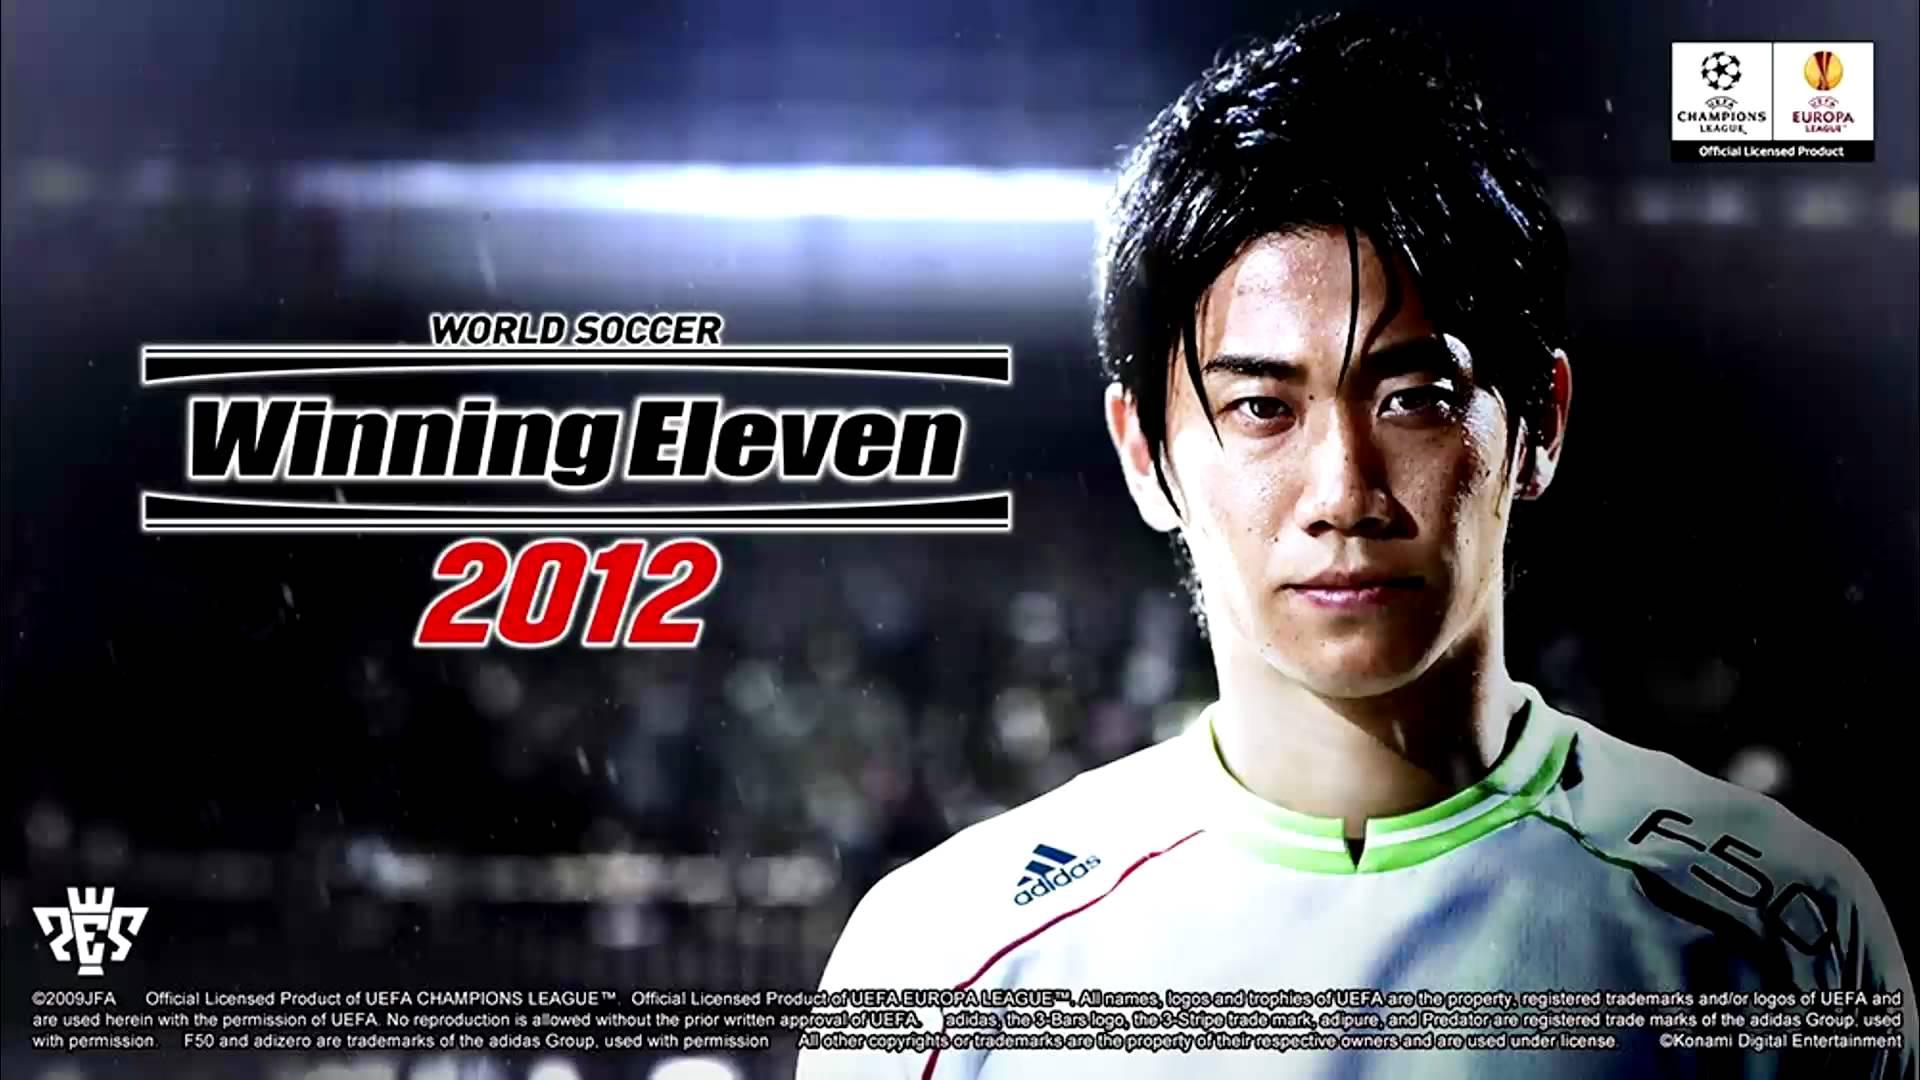 Winning Eleven 2012 Mod WE16 Apk Update Download